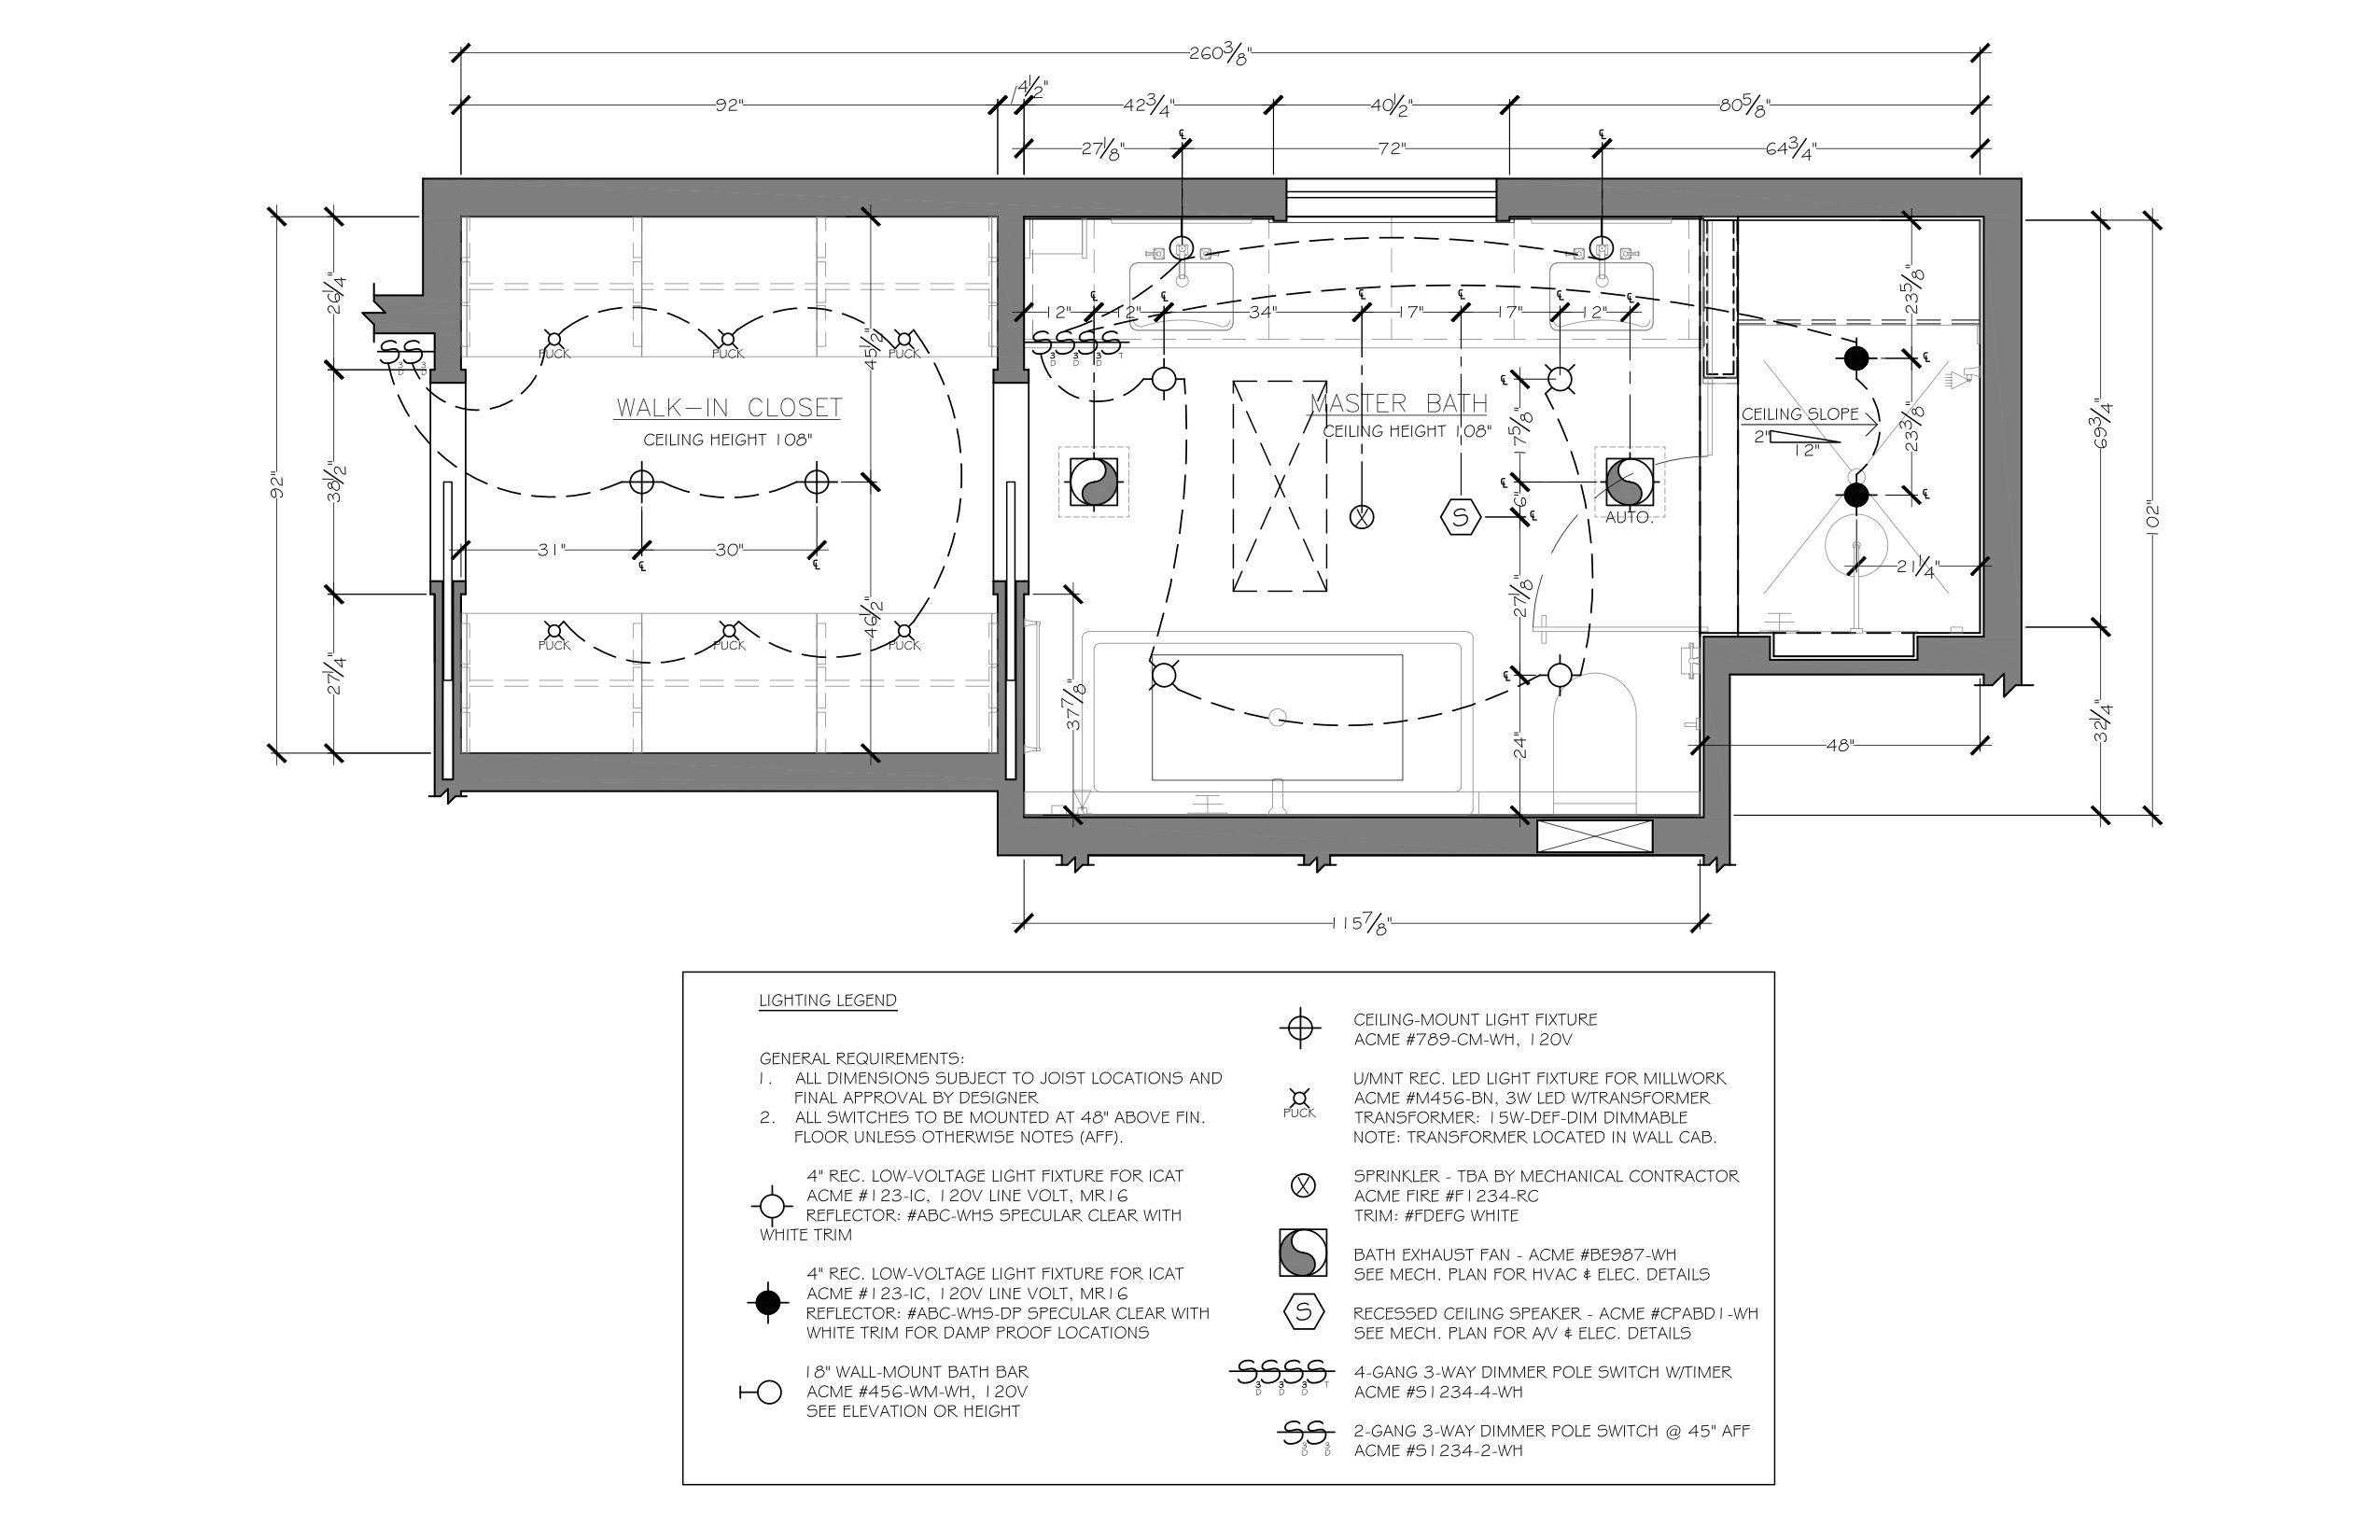 medium resolution of bathroom reflected ceiling plan example c 2013 corey klassen ckd used under permission from the national kitchen bath association